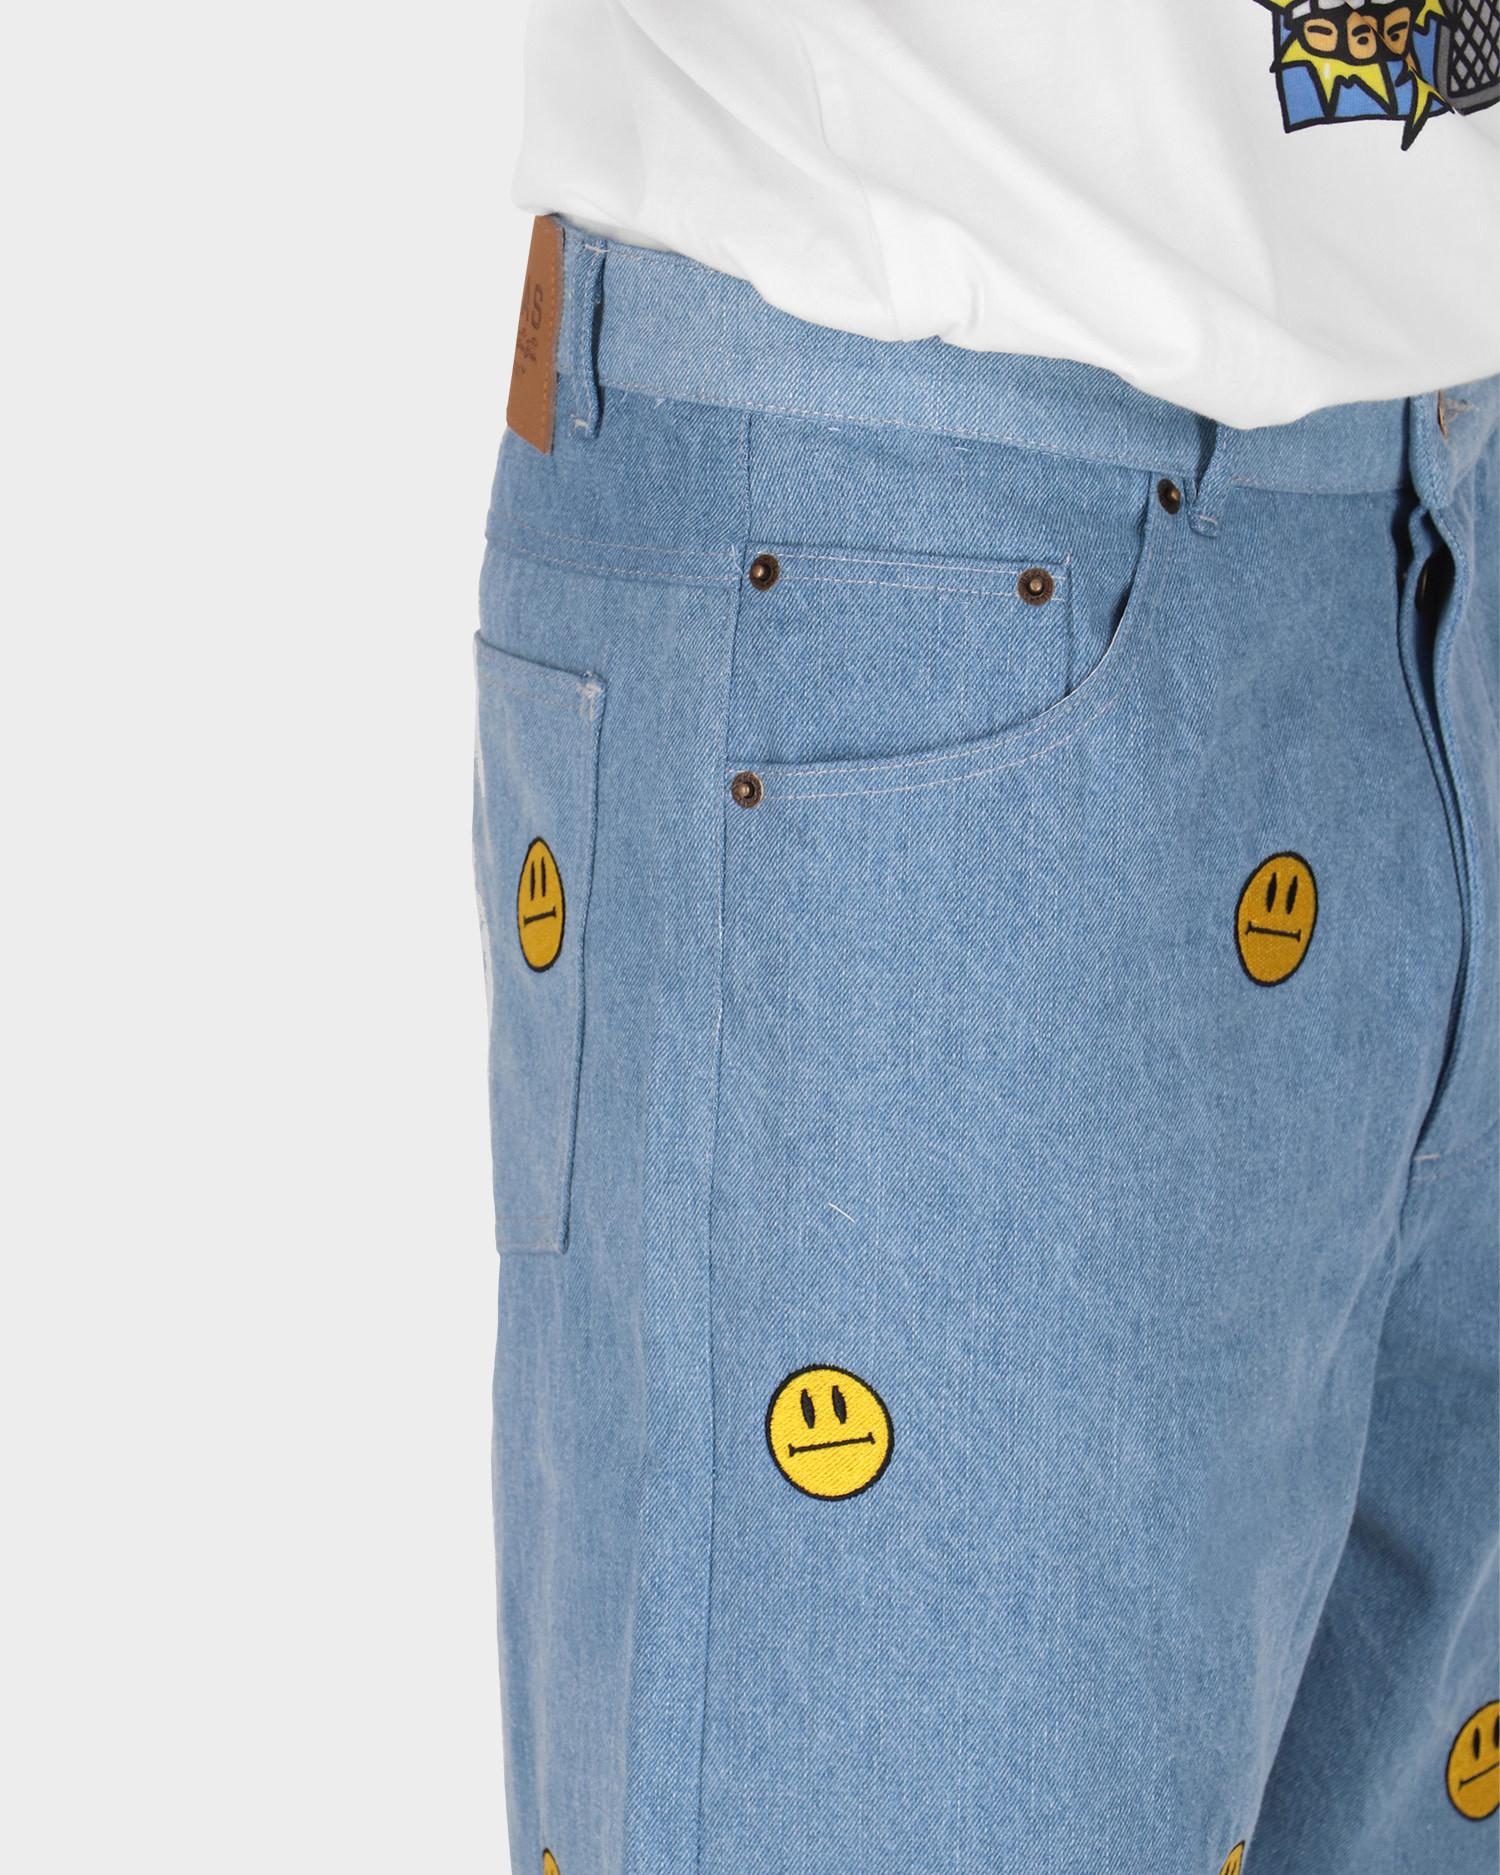 Helas Smiler Pant Light Blue